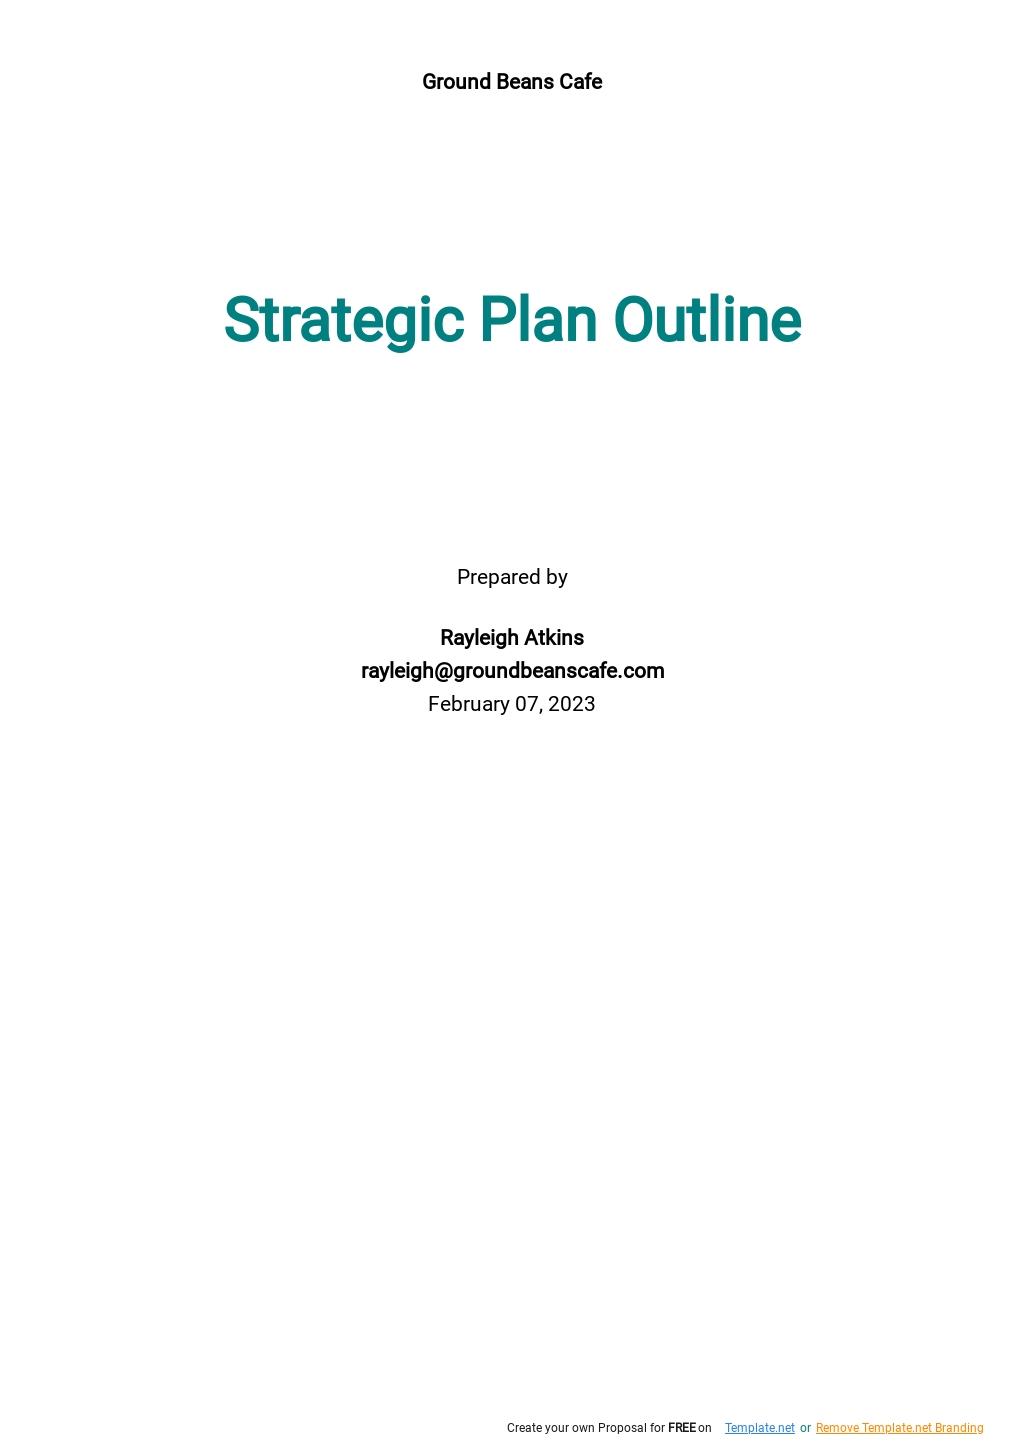 Strategic Plan Outline Template.jpe